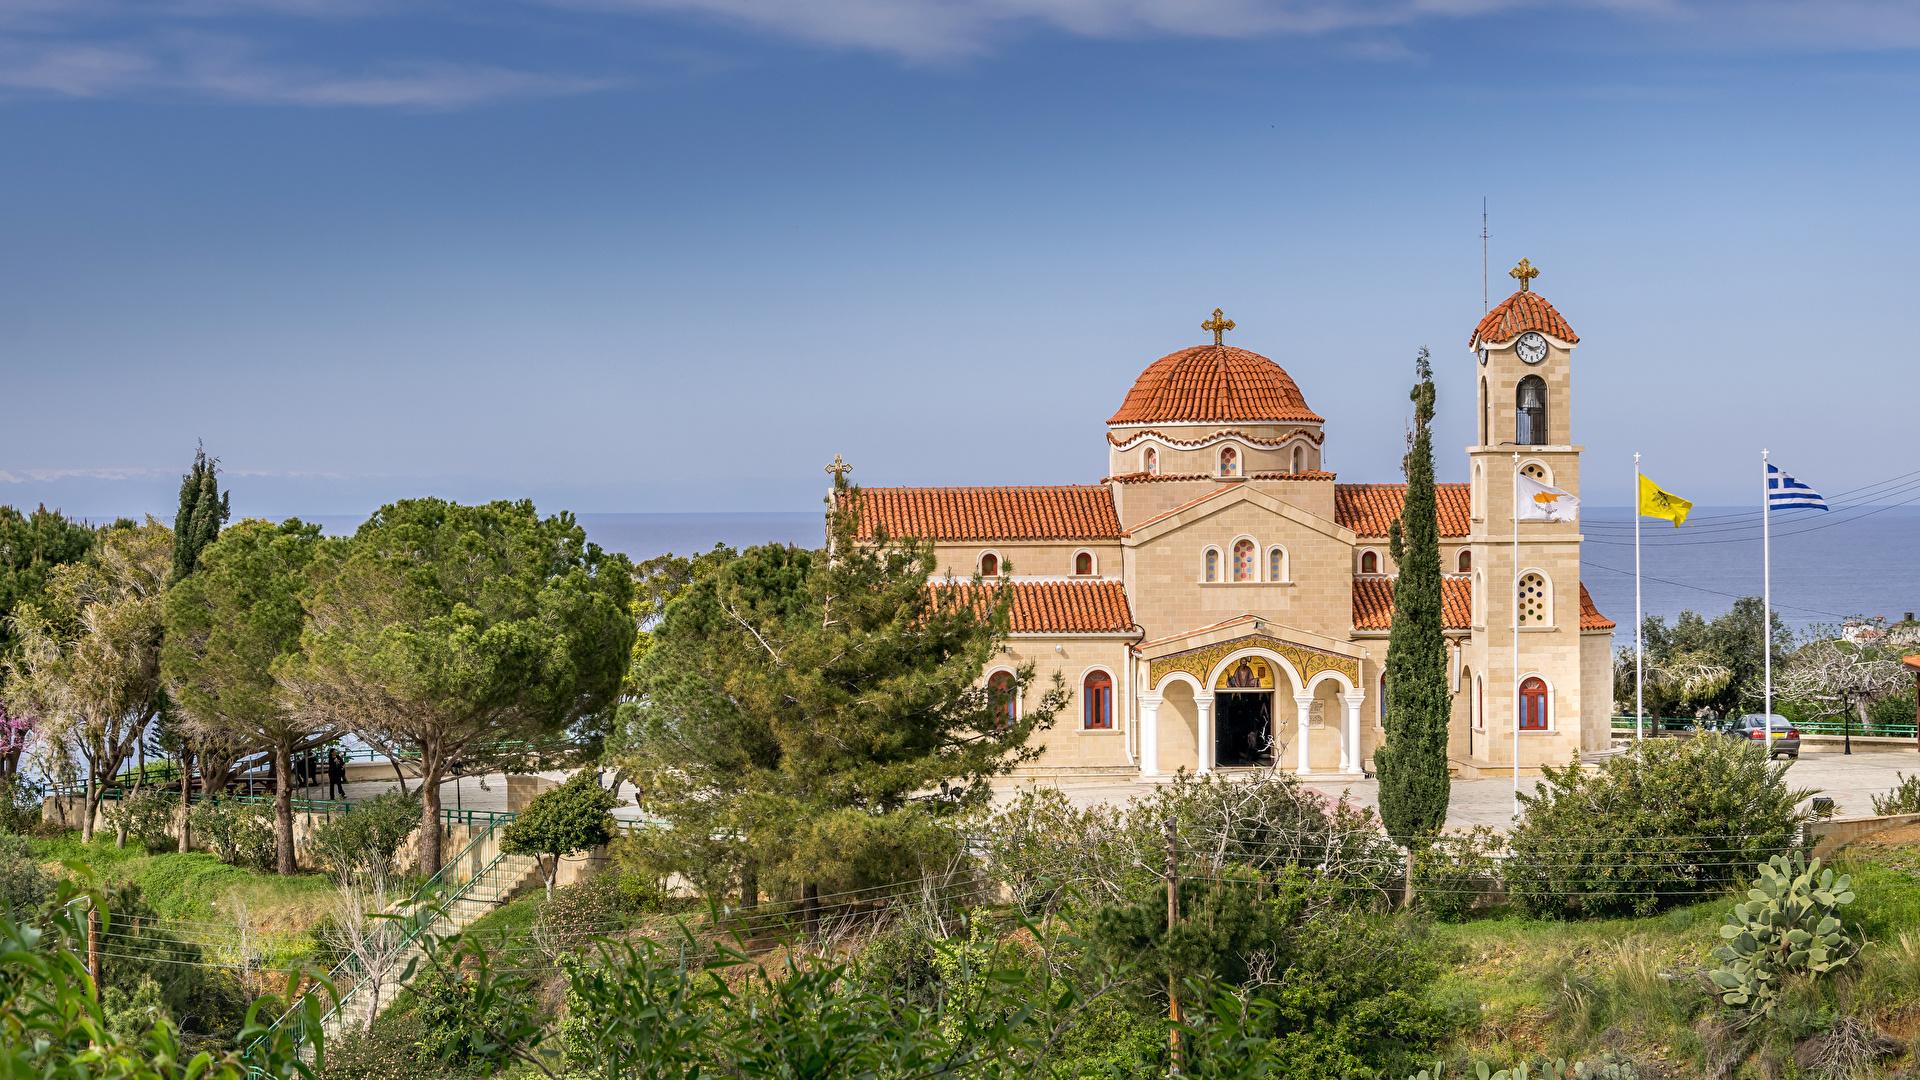 Immagini La chiesa Cipro Agios Raphael Church Pachyammos Cyprus Tempio Alberi Città 1920x1080